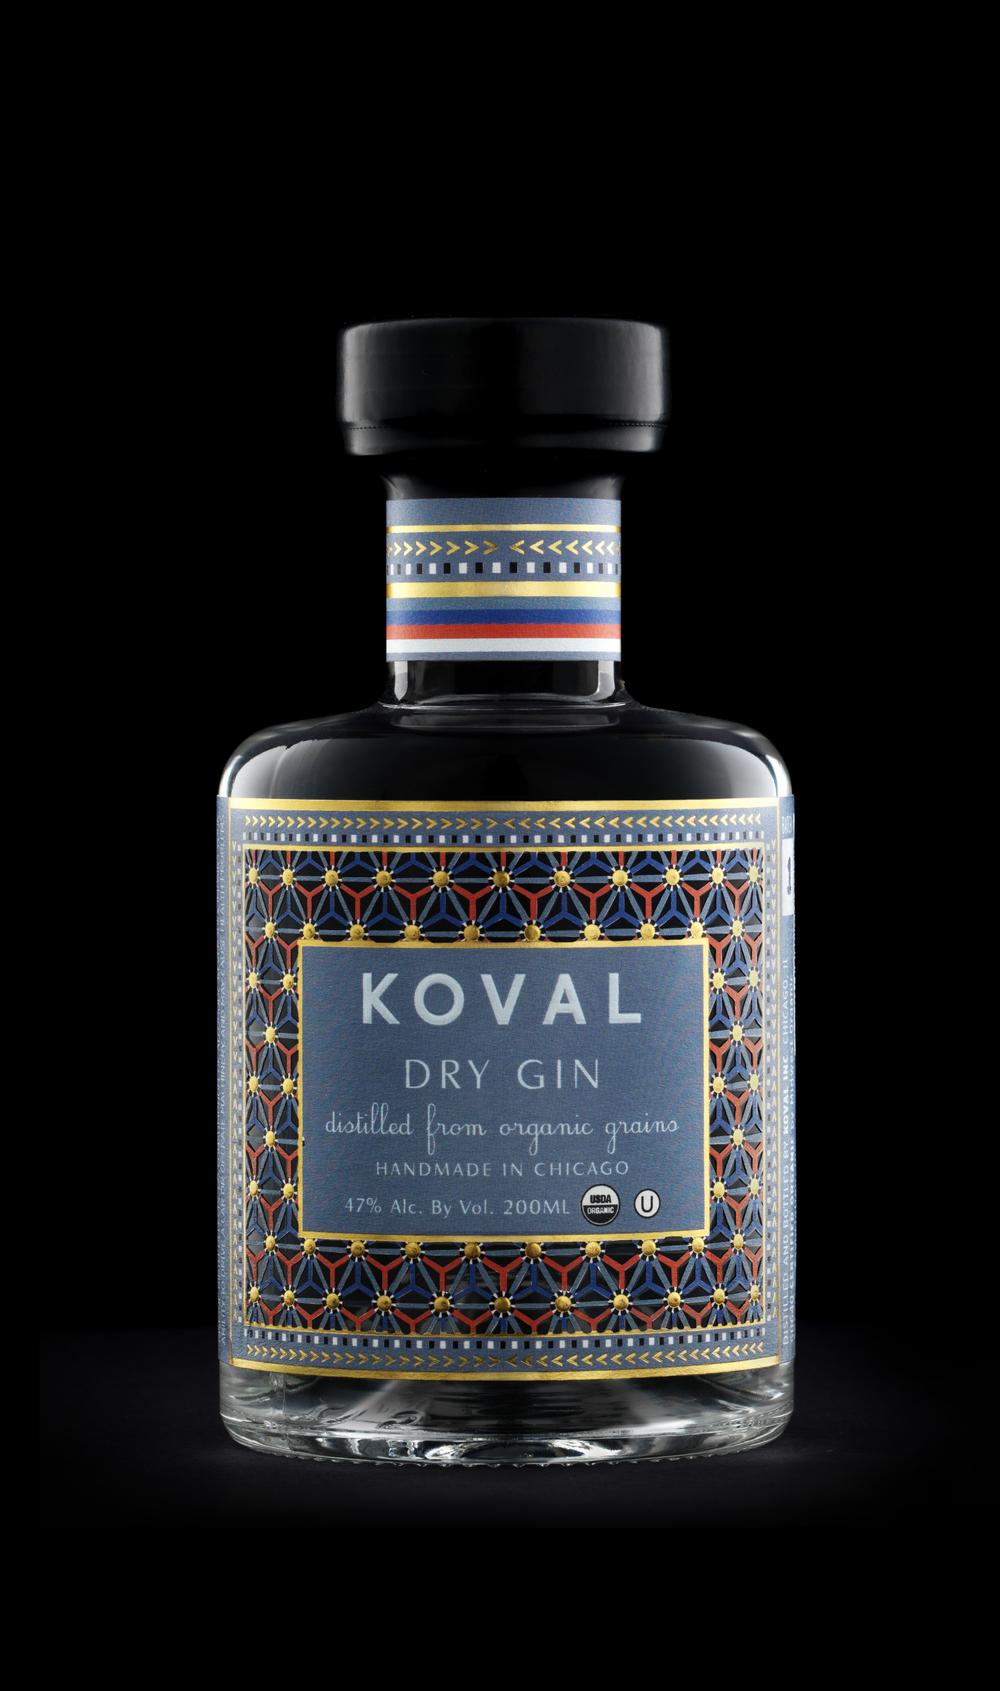 Koval Dry Gin The Dieline Branding Amp Packaging